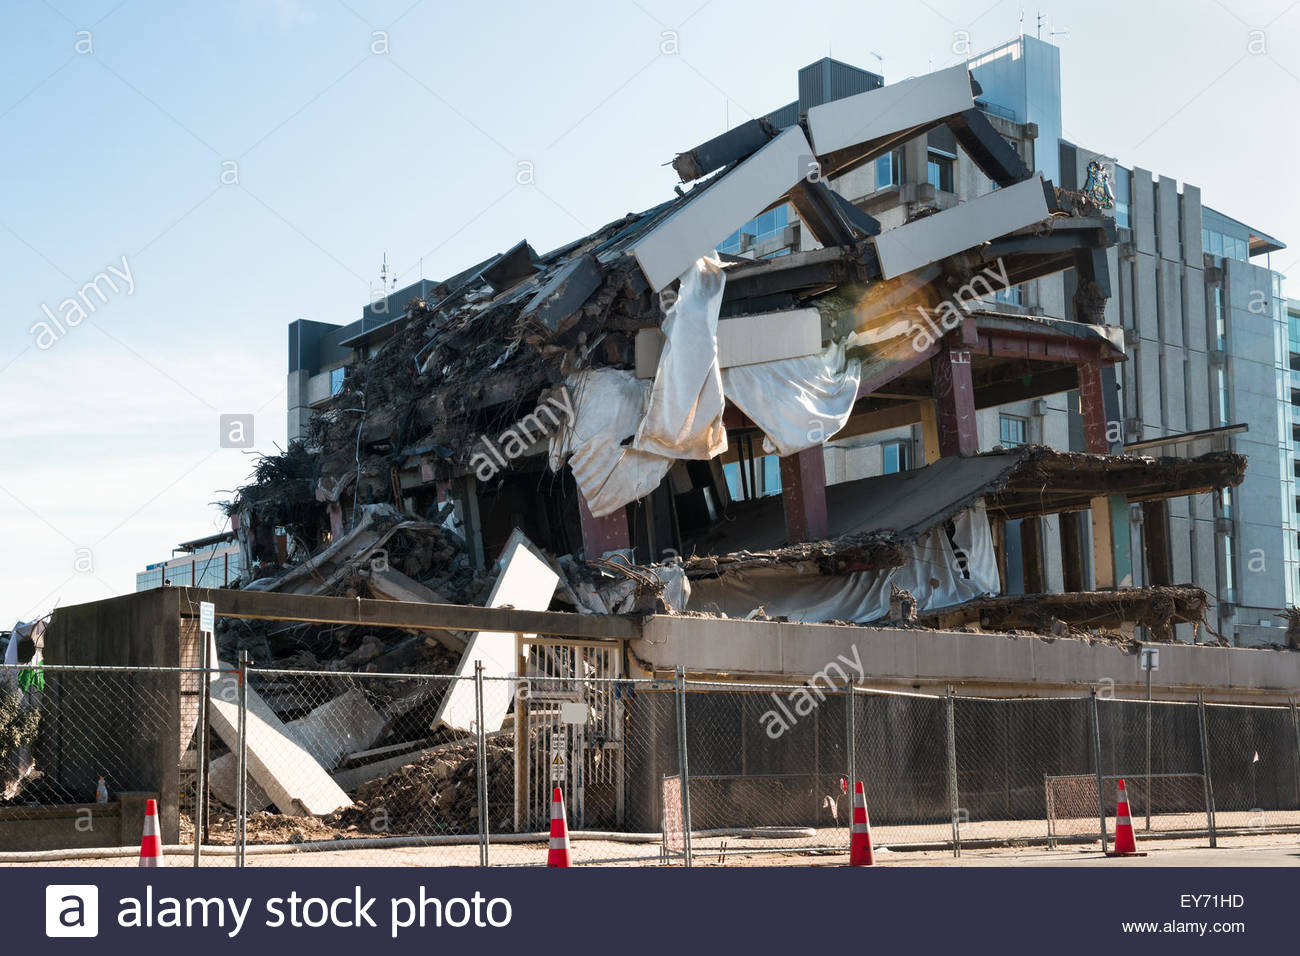 Christchurch News Photo: Building Demolished By An Earthquake, Christchurch, New